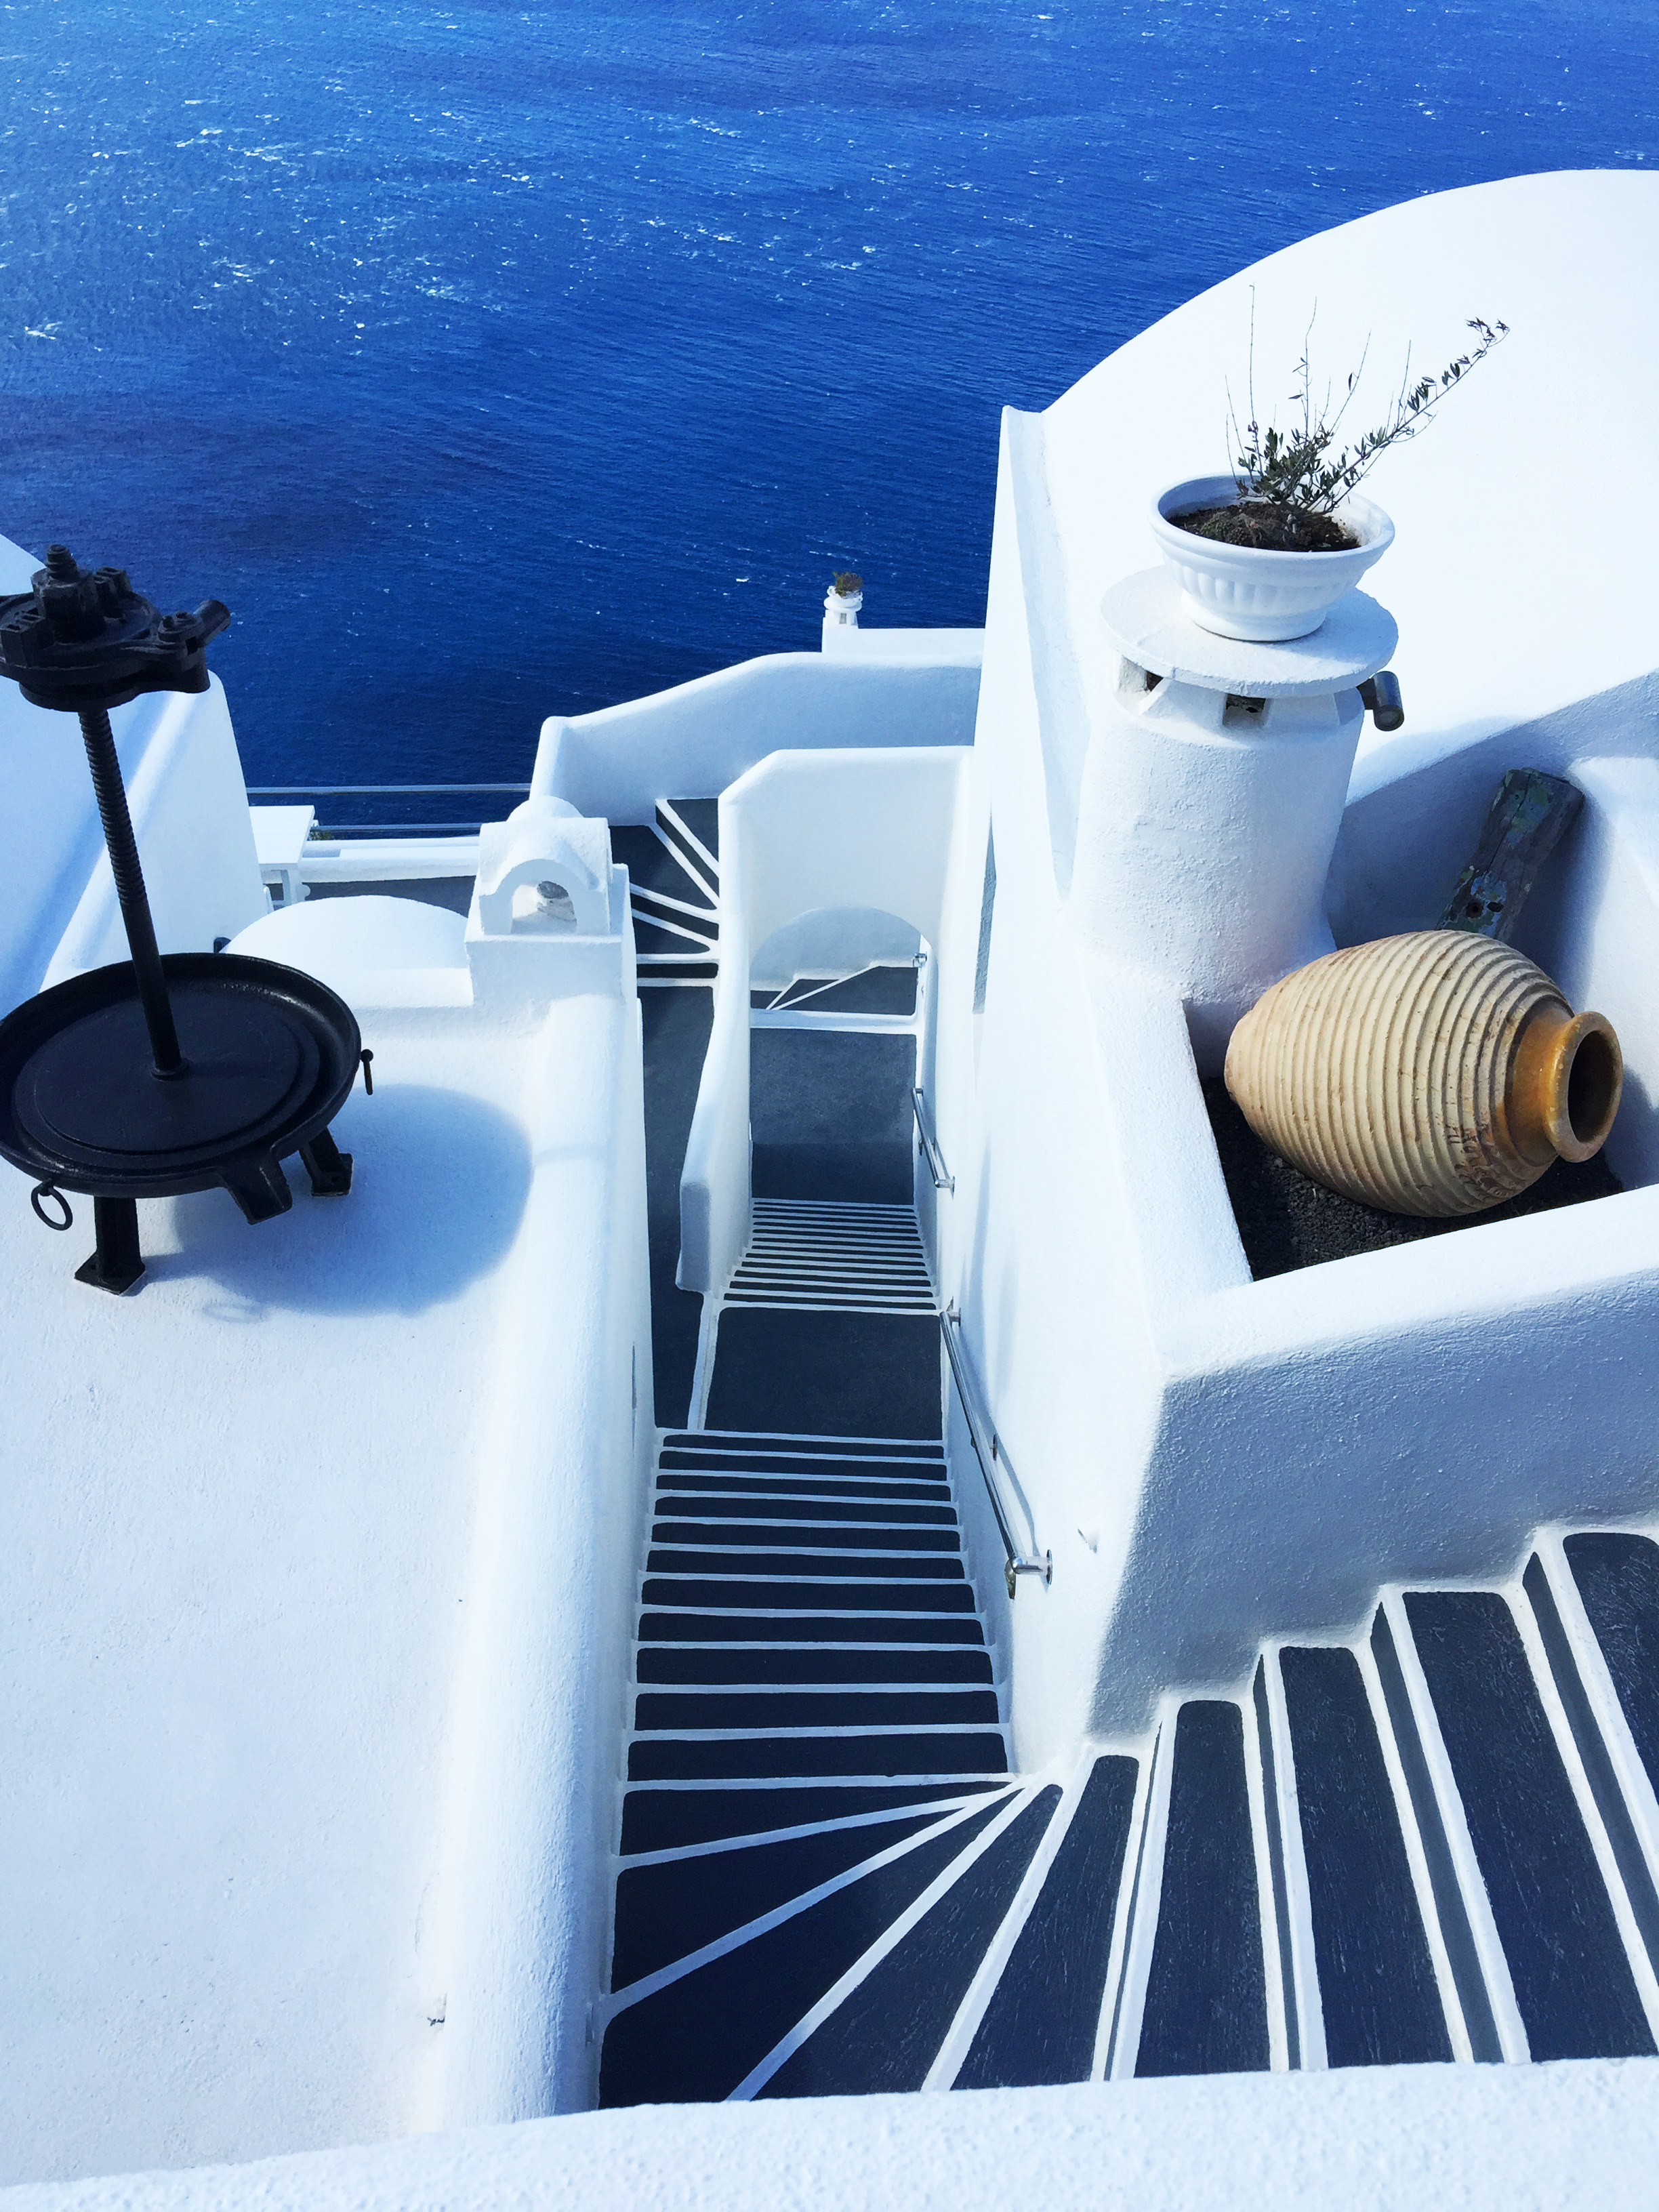 Santorini stepenice Grčka